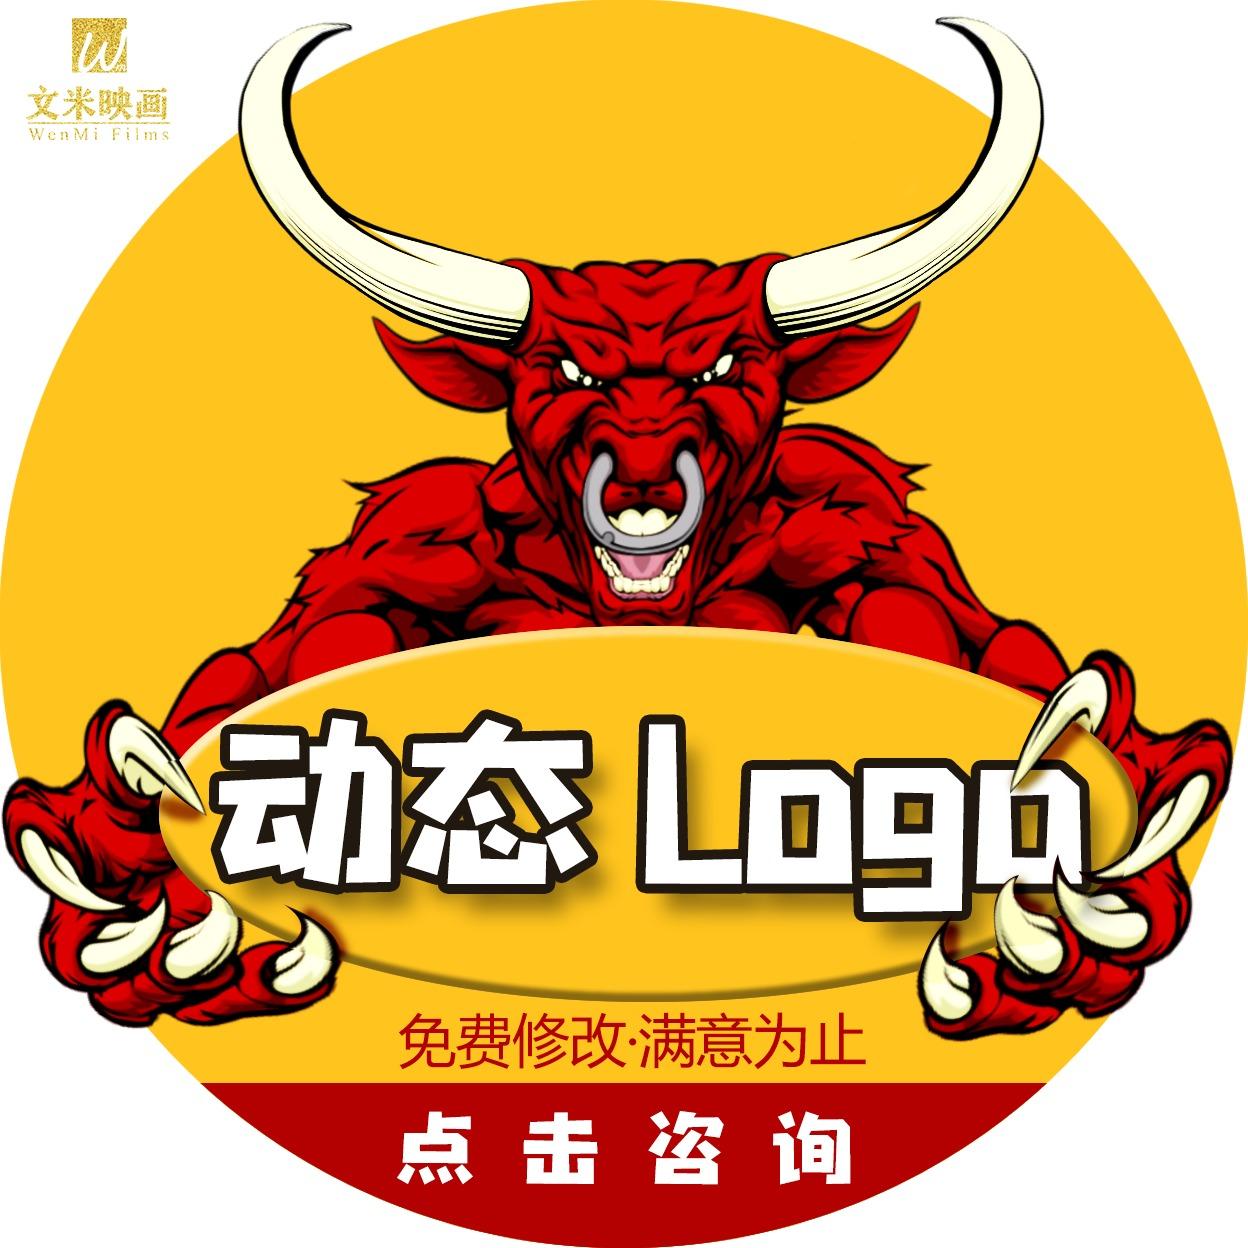 LOGO设计LOGO动画设计动态logo设计